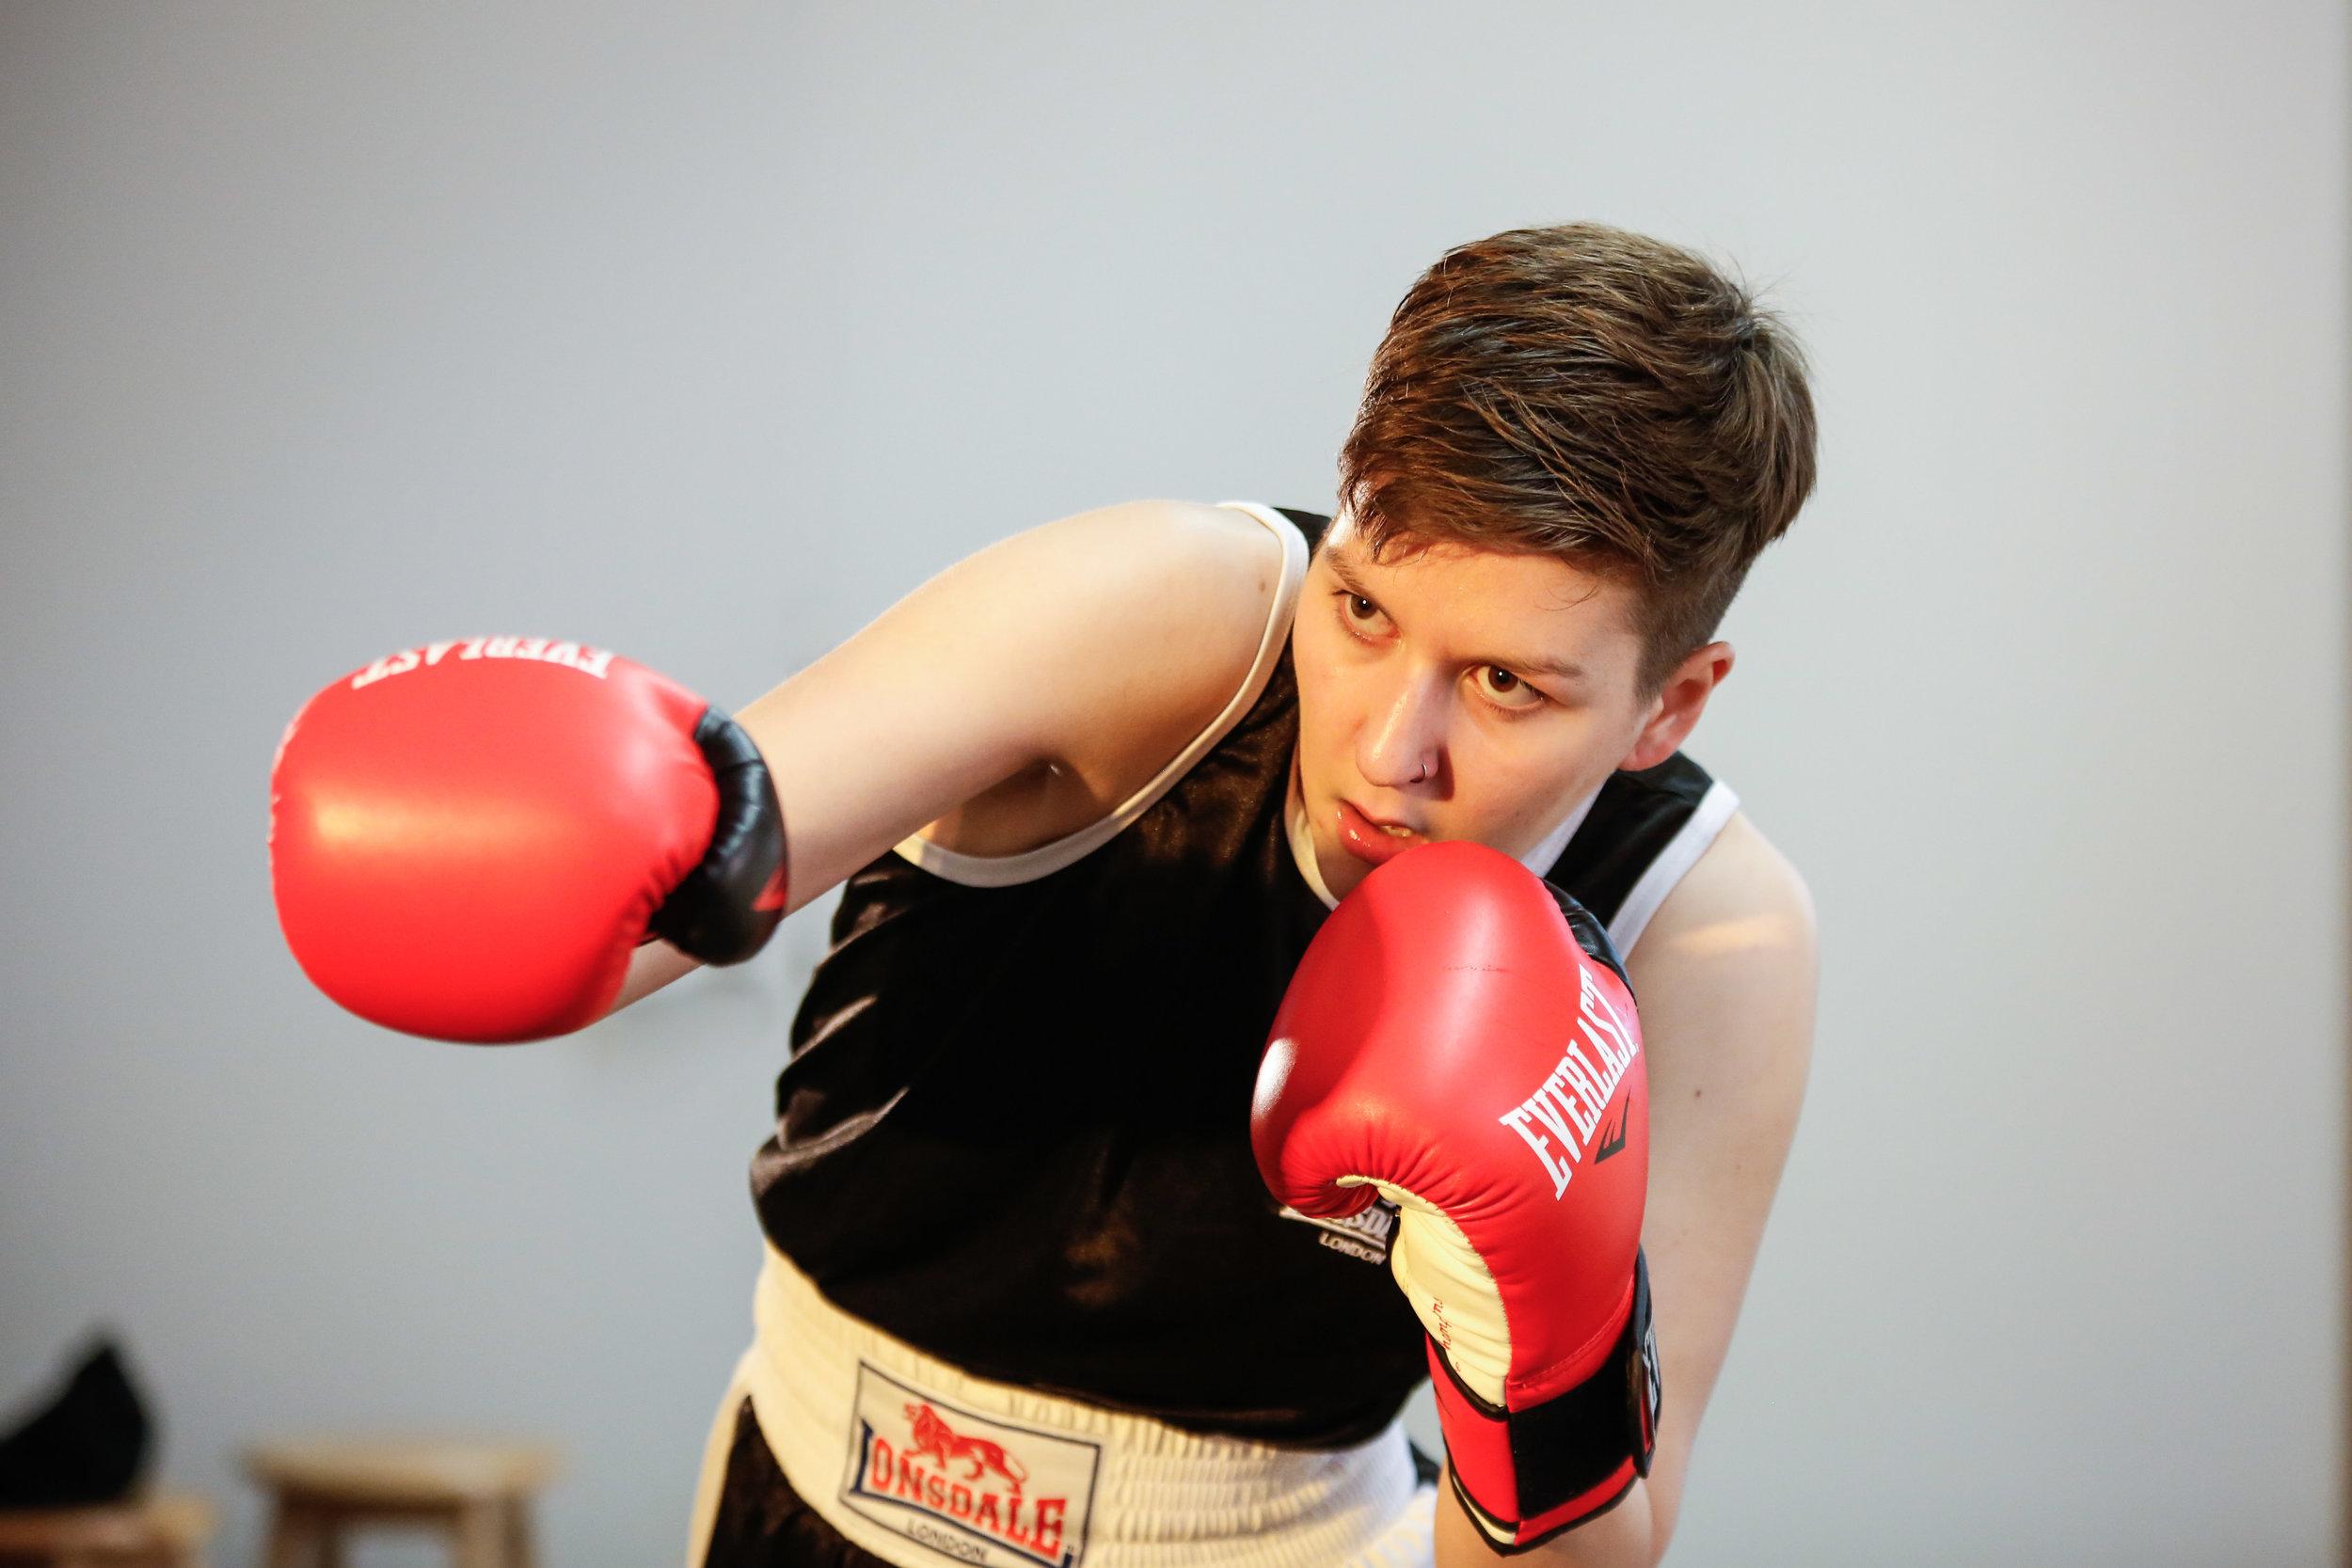 Bitch Boxer - written by Charlotte Josephine